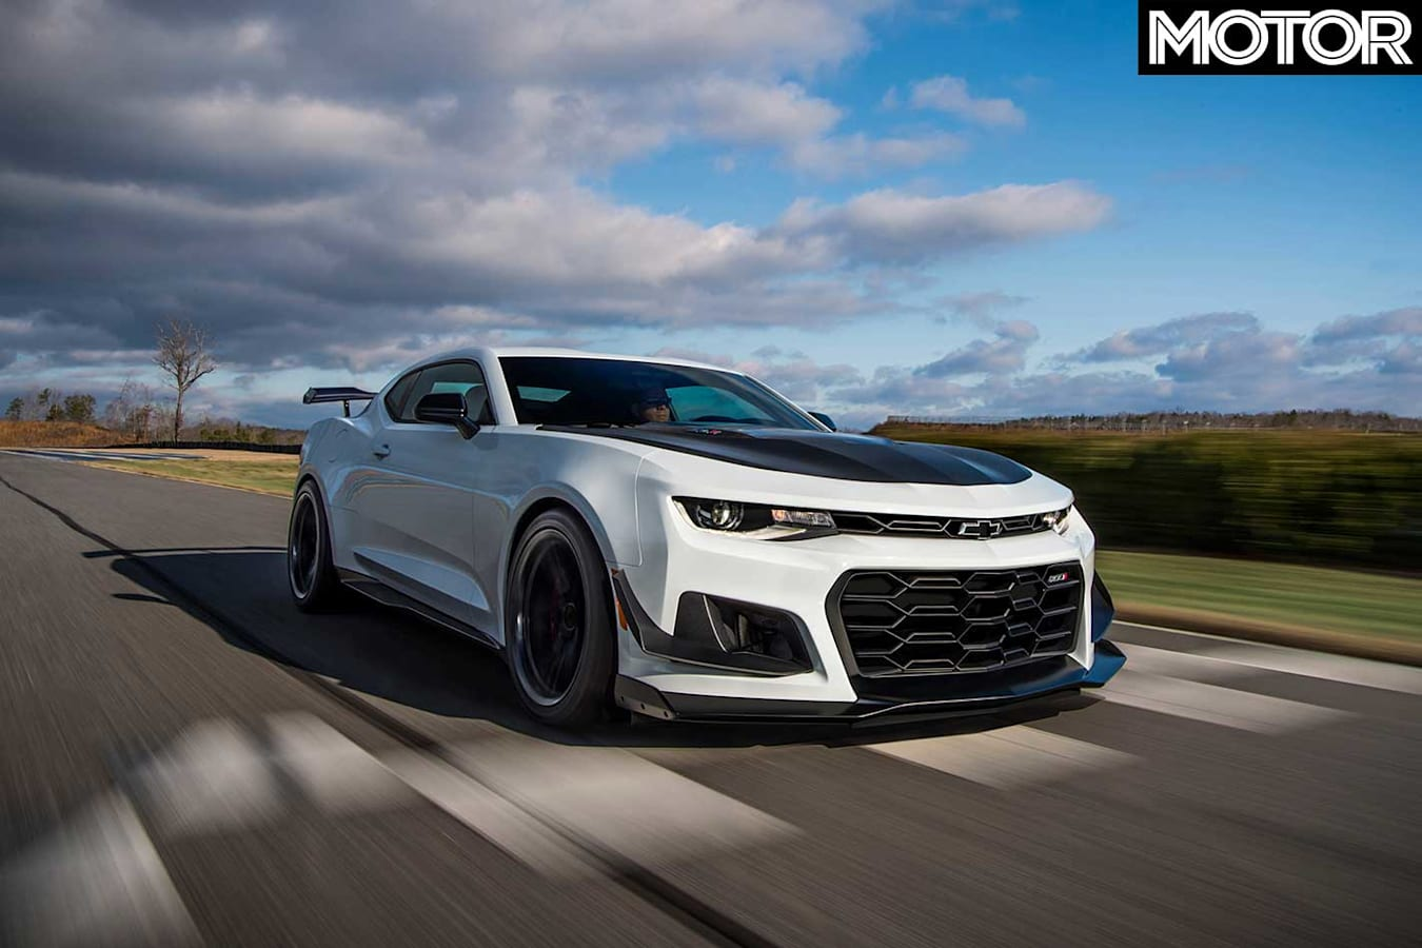 2018 HSV Chevrolet Camaro Need To Know 1 LE Jpg